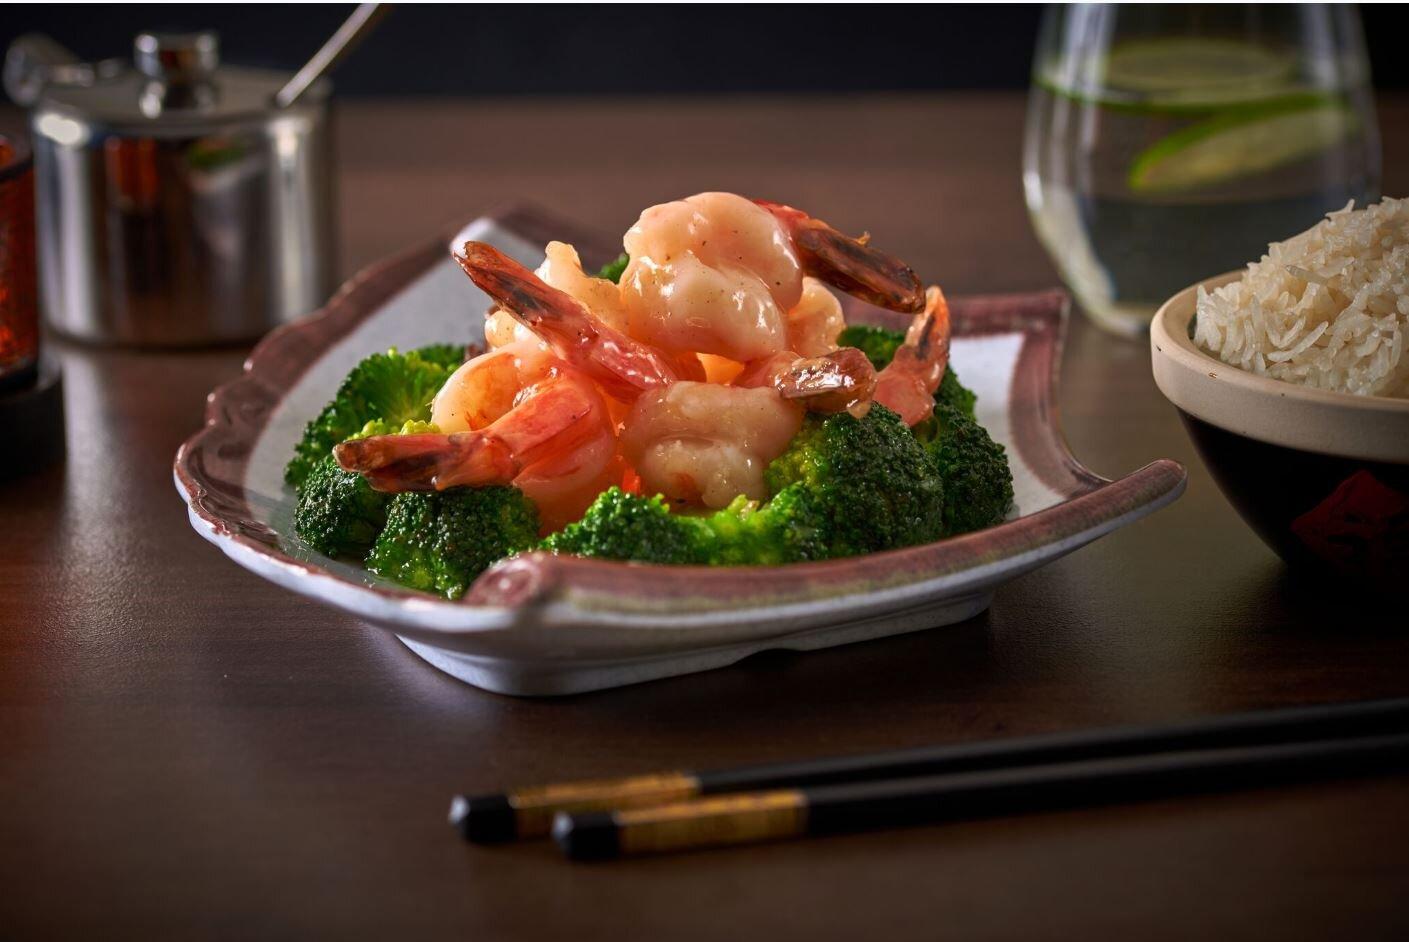 billig asiatisk mat